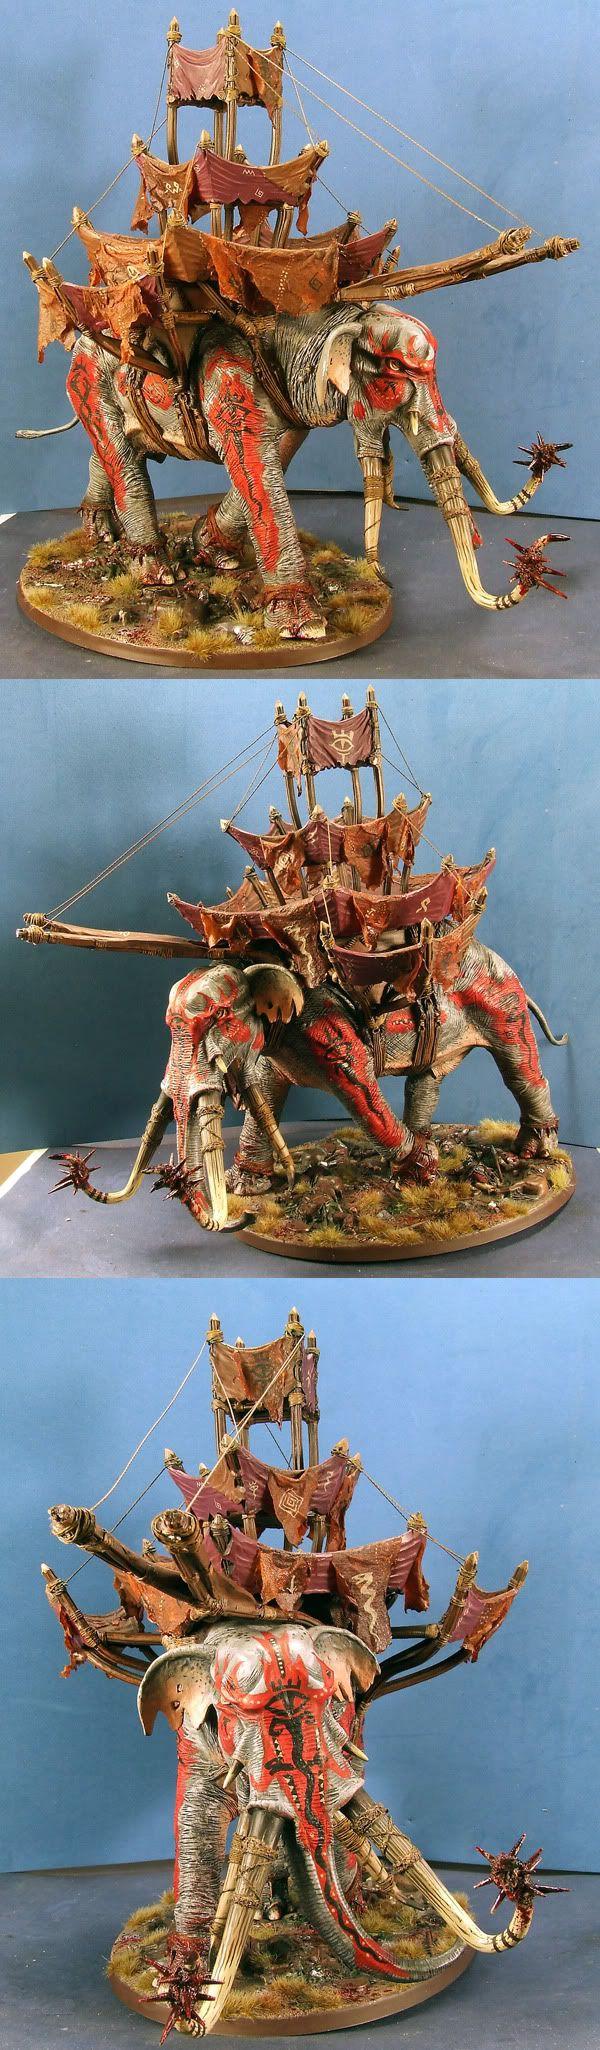 Games workshop lord of the Rings War Mumak of Harad